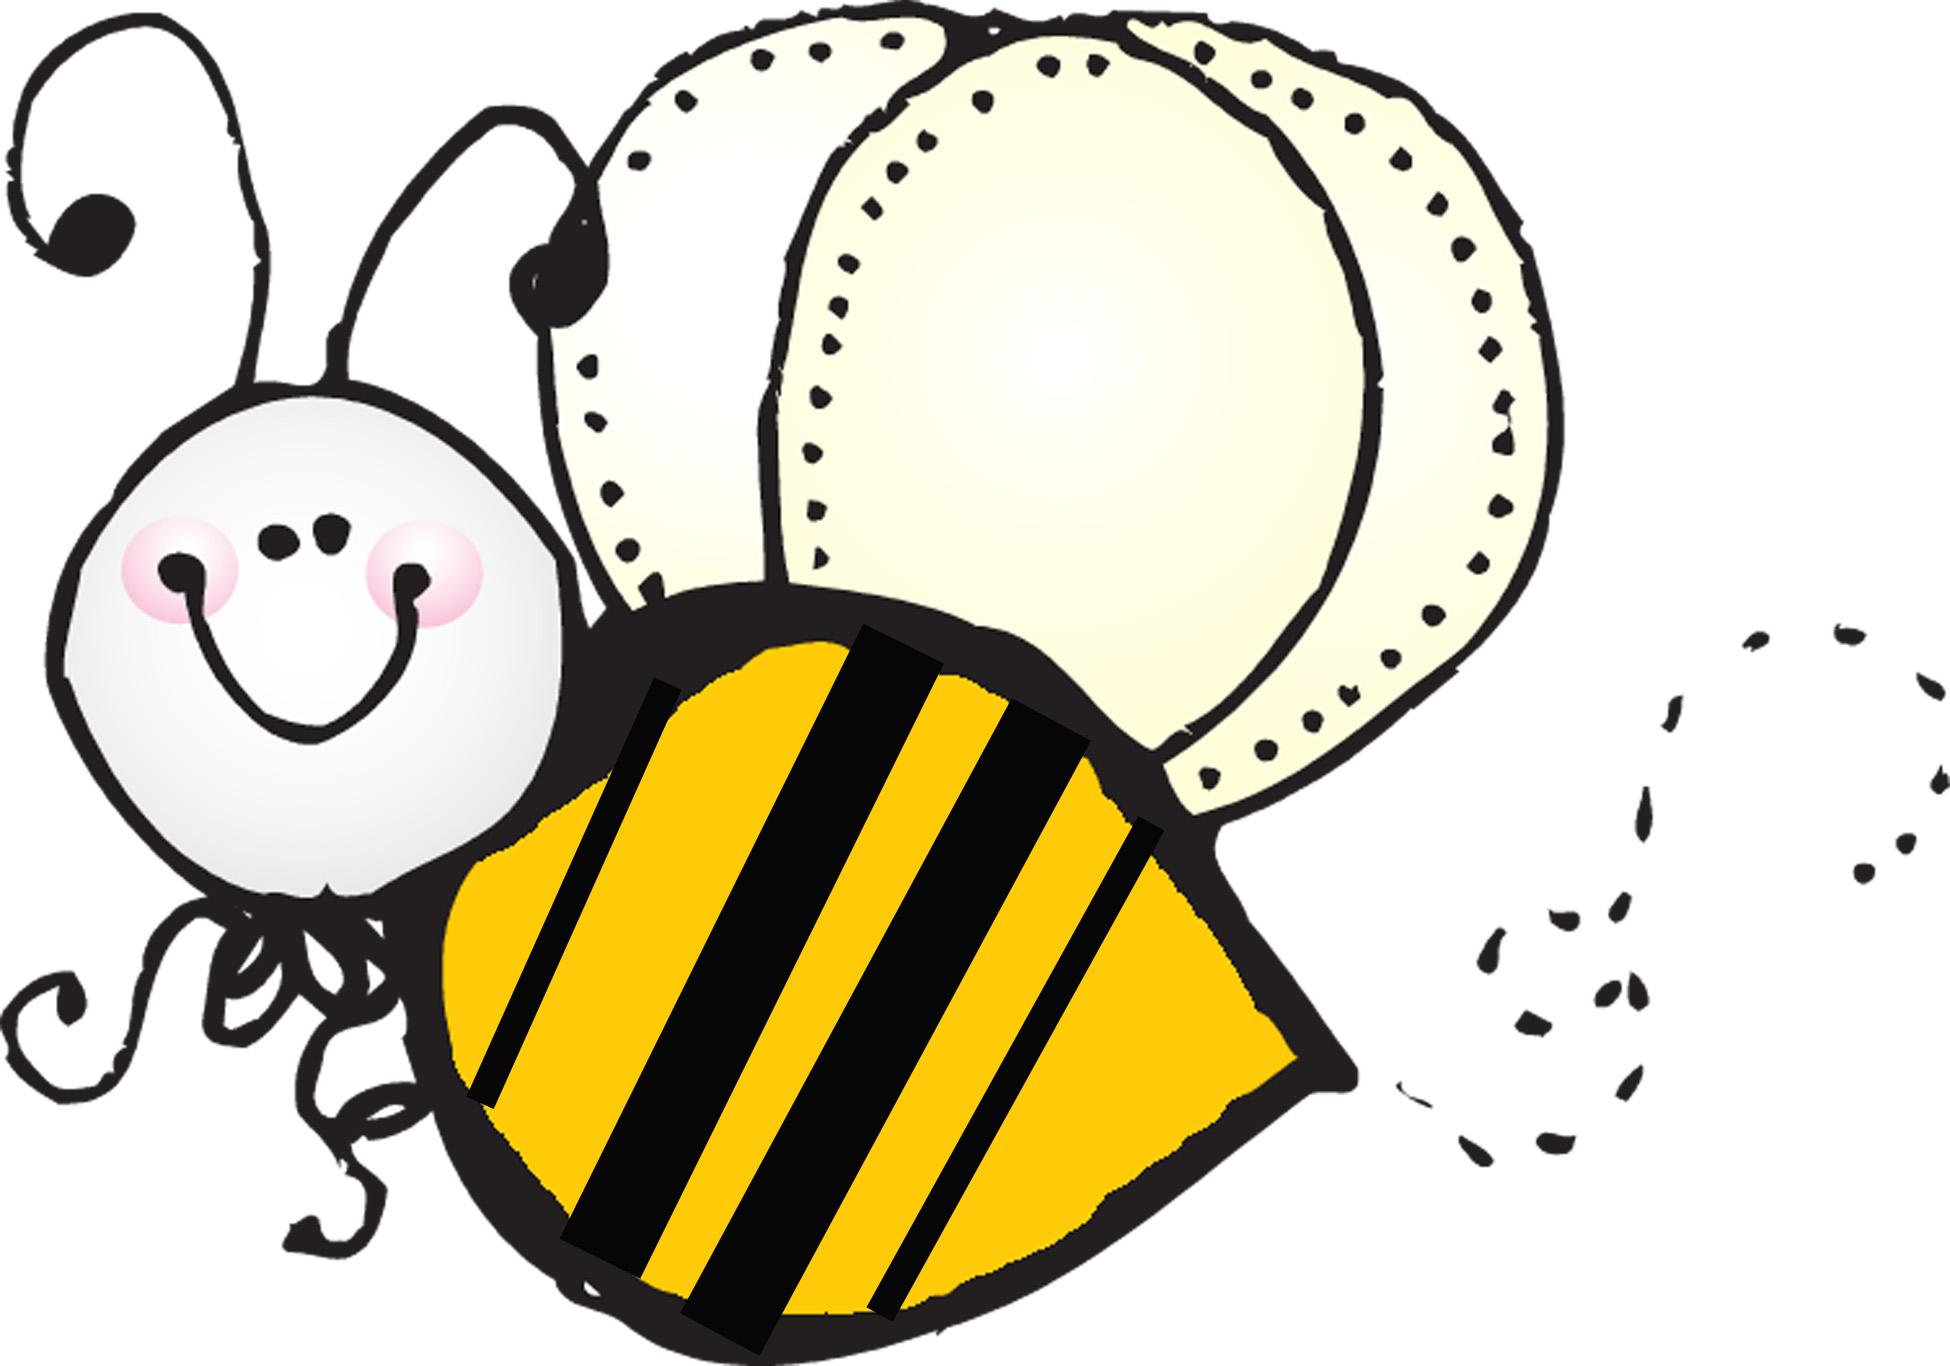 Bumble bee vector bee clipart .